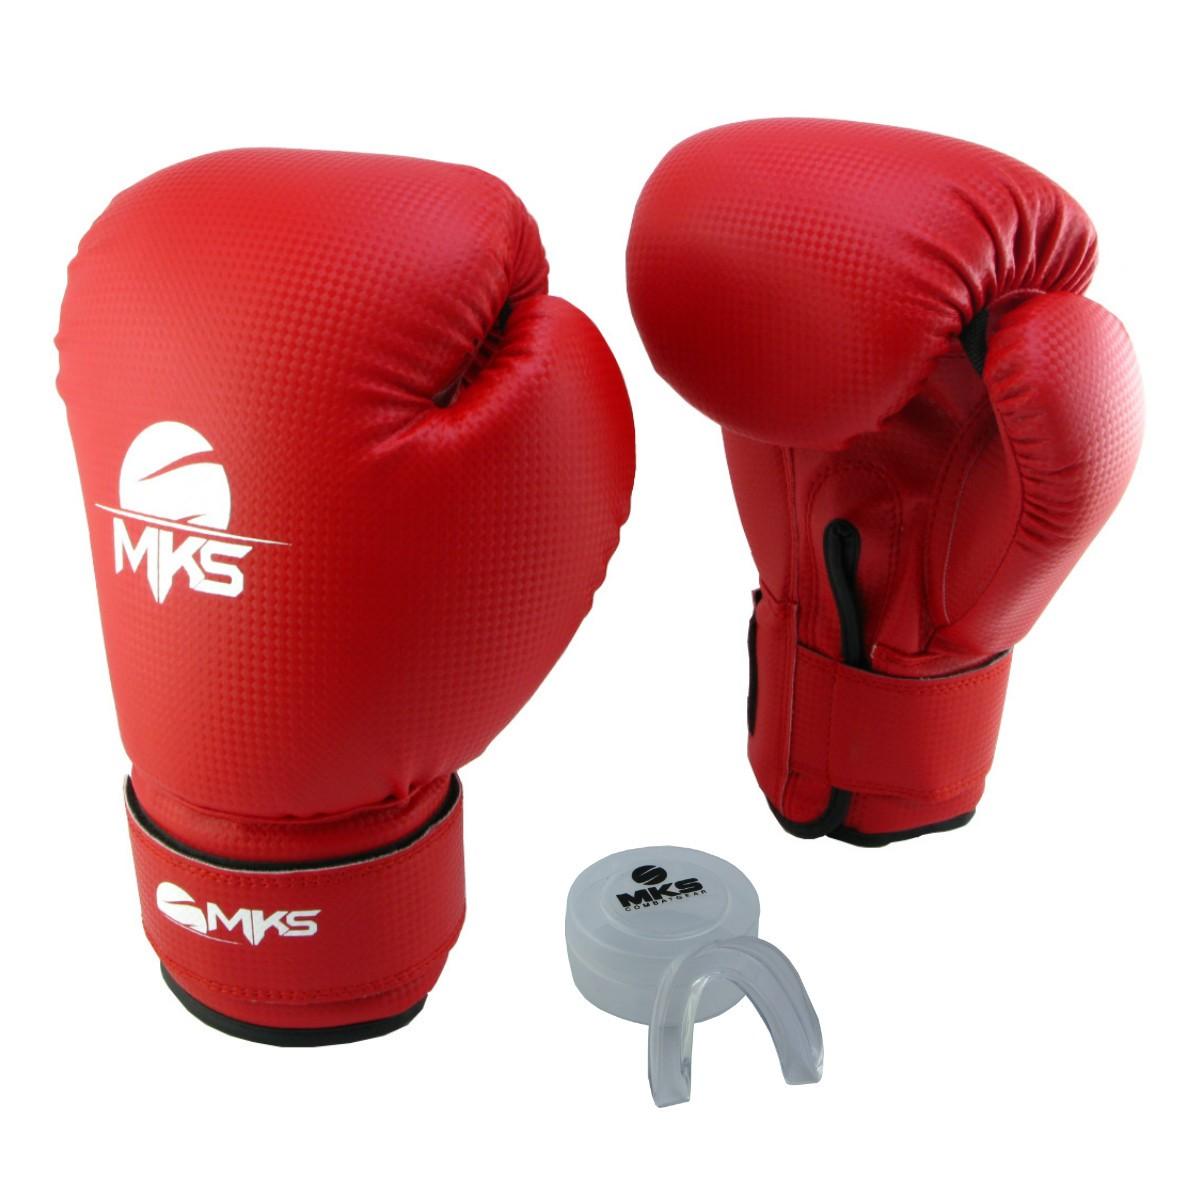 Luva de Boxe Prospect MKS Vermelha 12 oz + Protetor Bucal